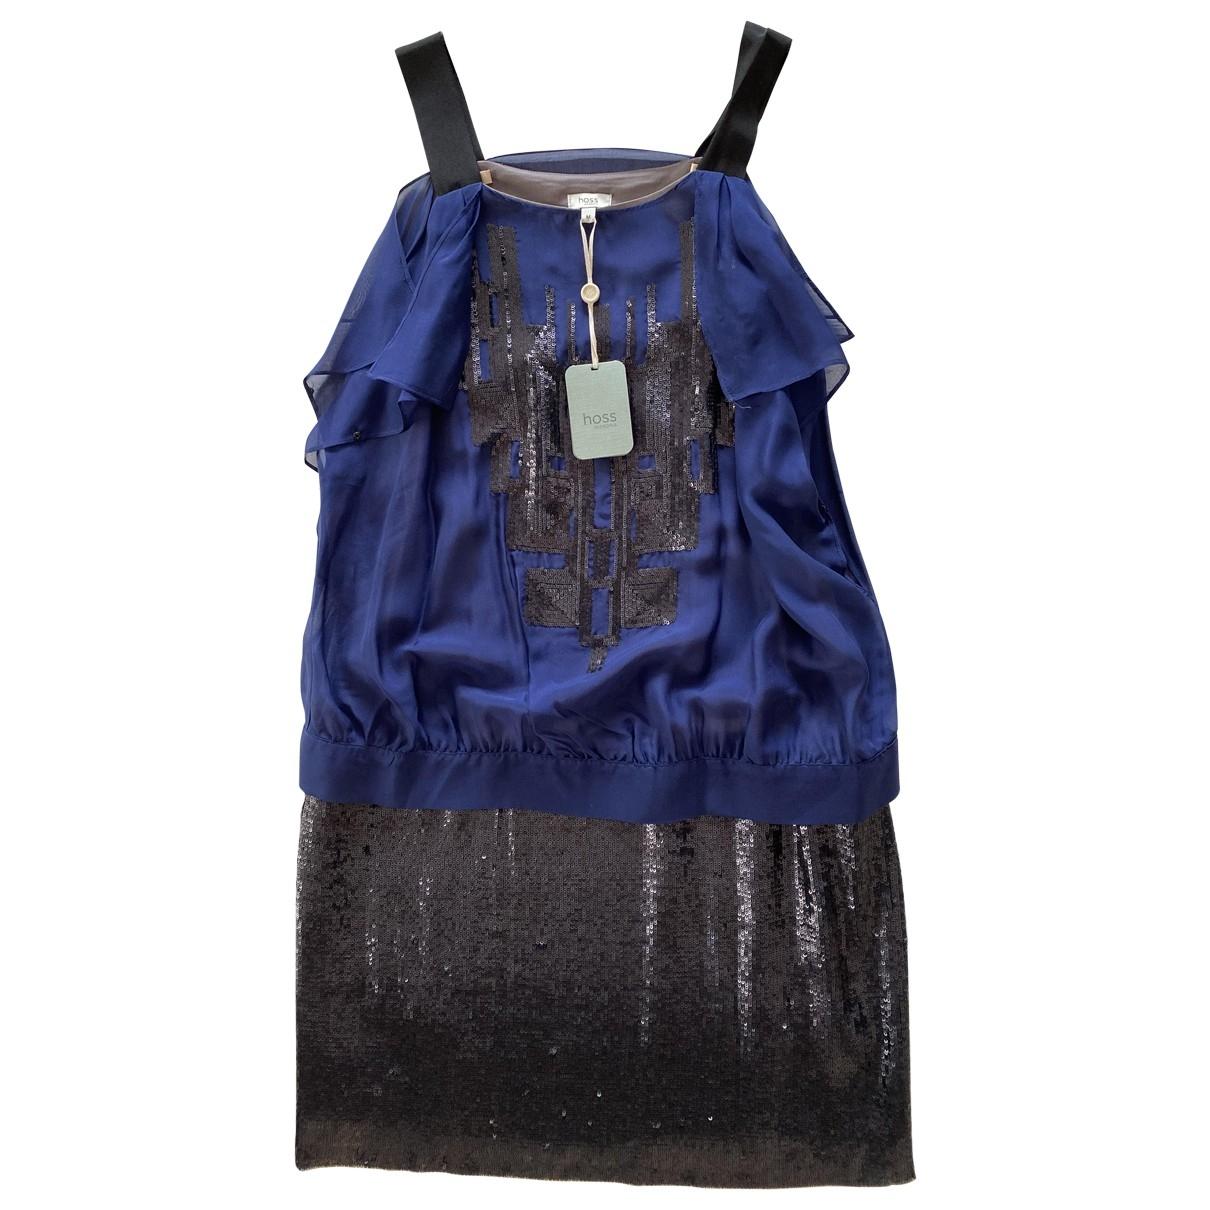 Mini vestido de Con lentejuelas Hoss Intropia